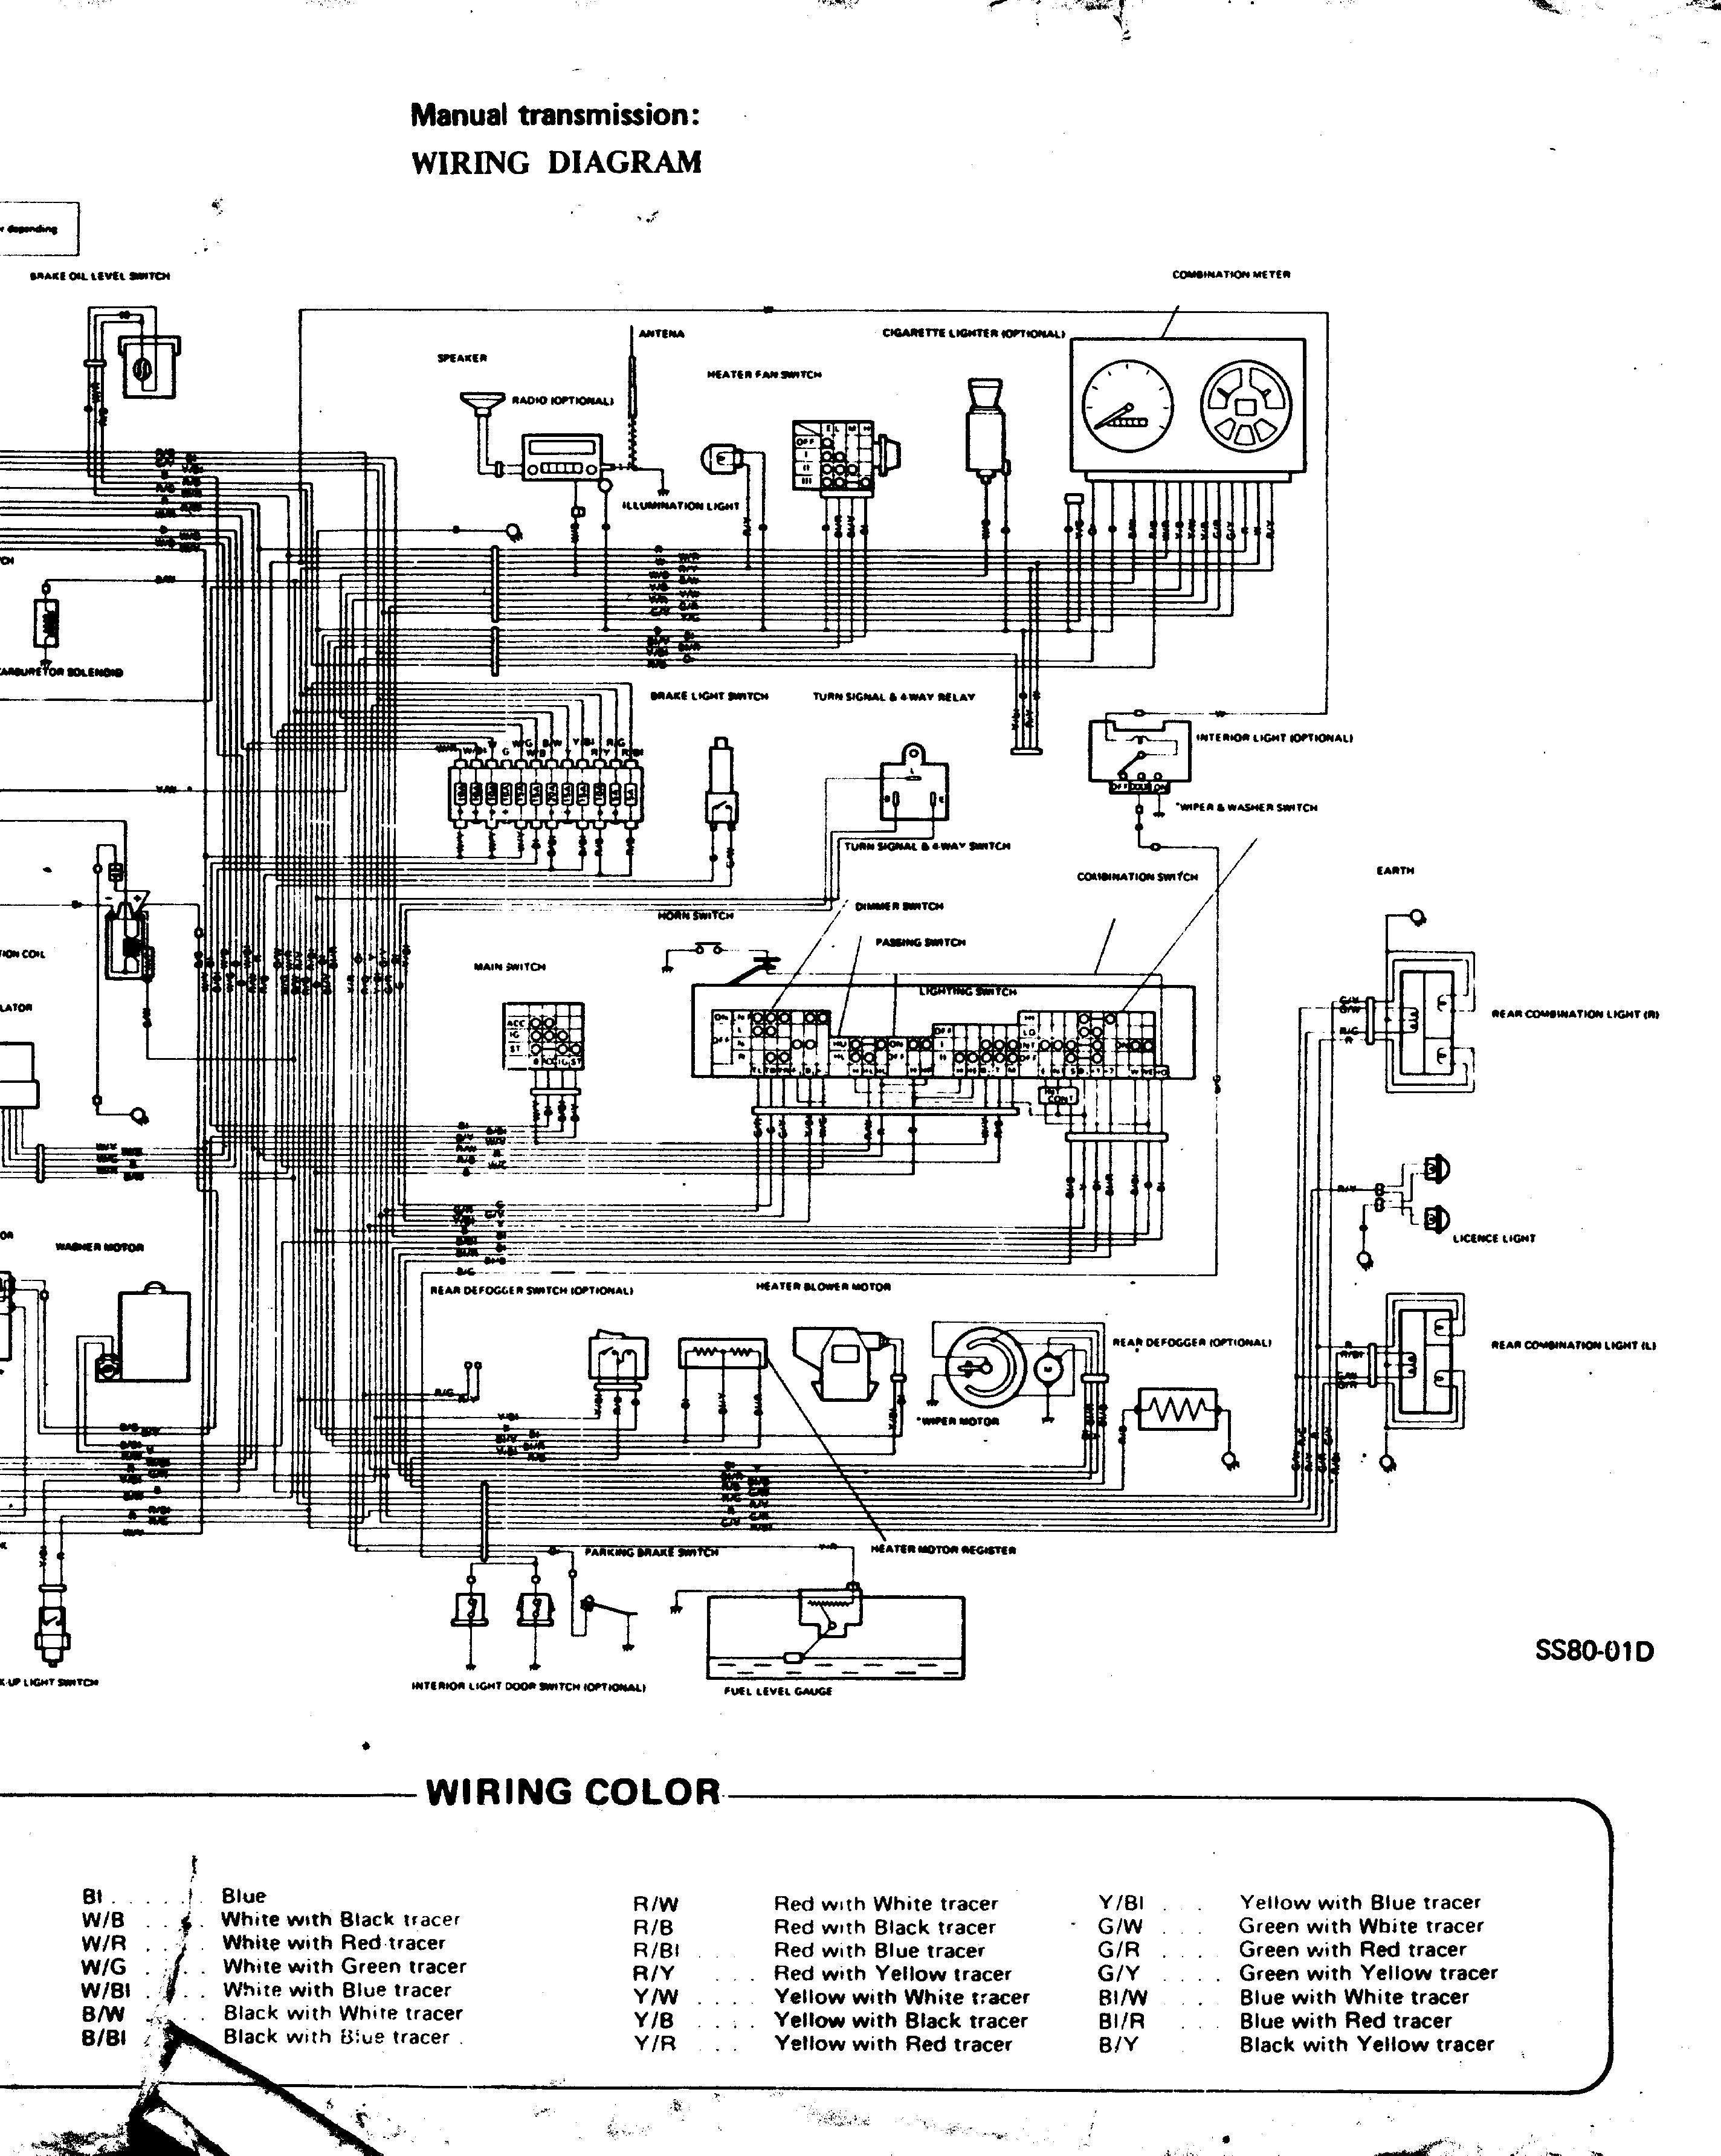 whirlpool lgb6200k dryer wiring diagram 4b5 suzuki wagon r repair manual wiring resources  4b5 suzuki wagon r repair manual